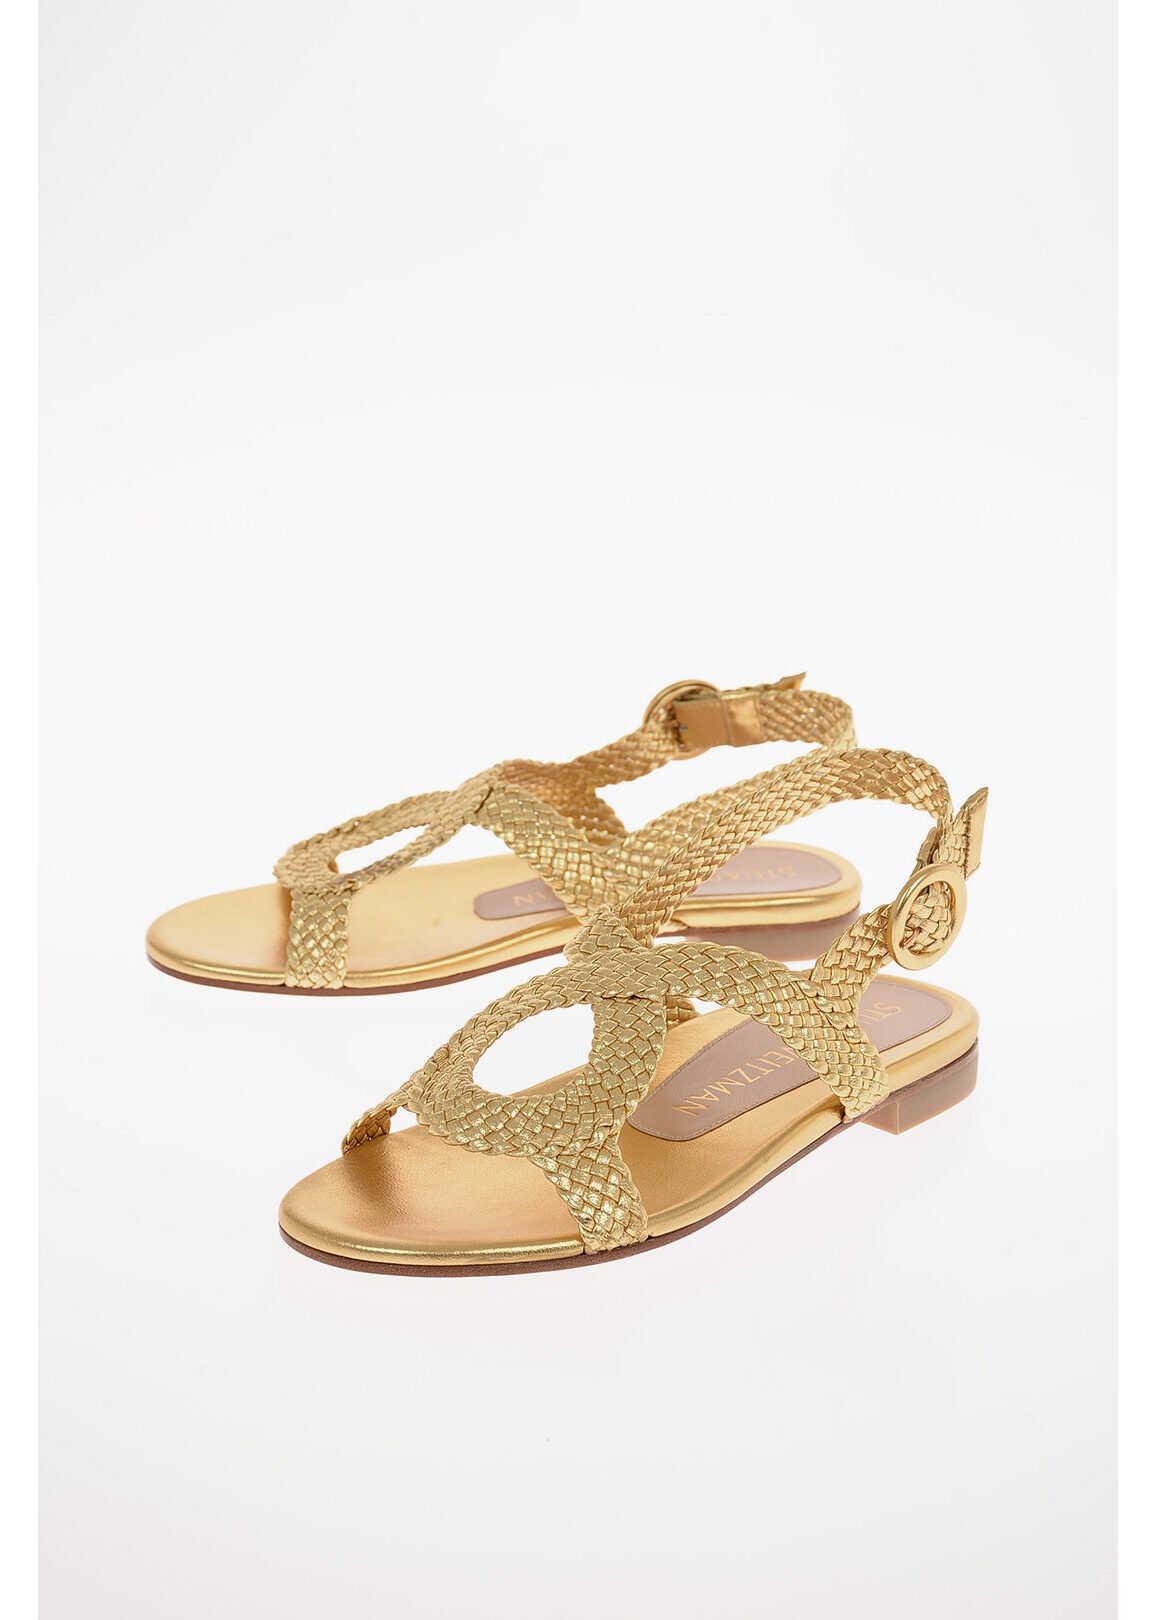 Stuart Weitzman Braided Metallic Leather TEODORA Sandals 1.5 cm GOLD imagine b-mall.ro